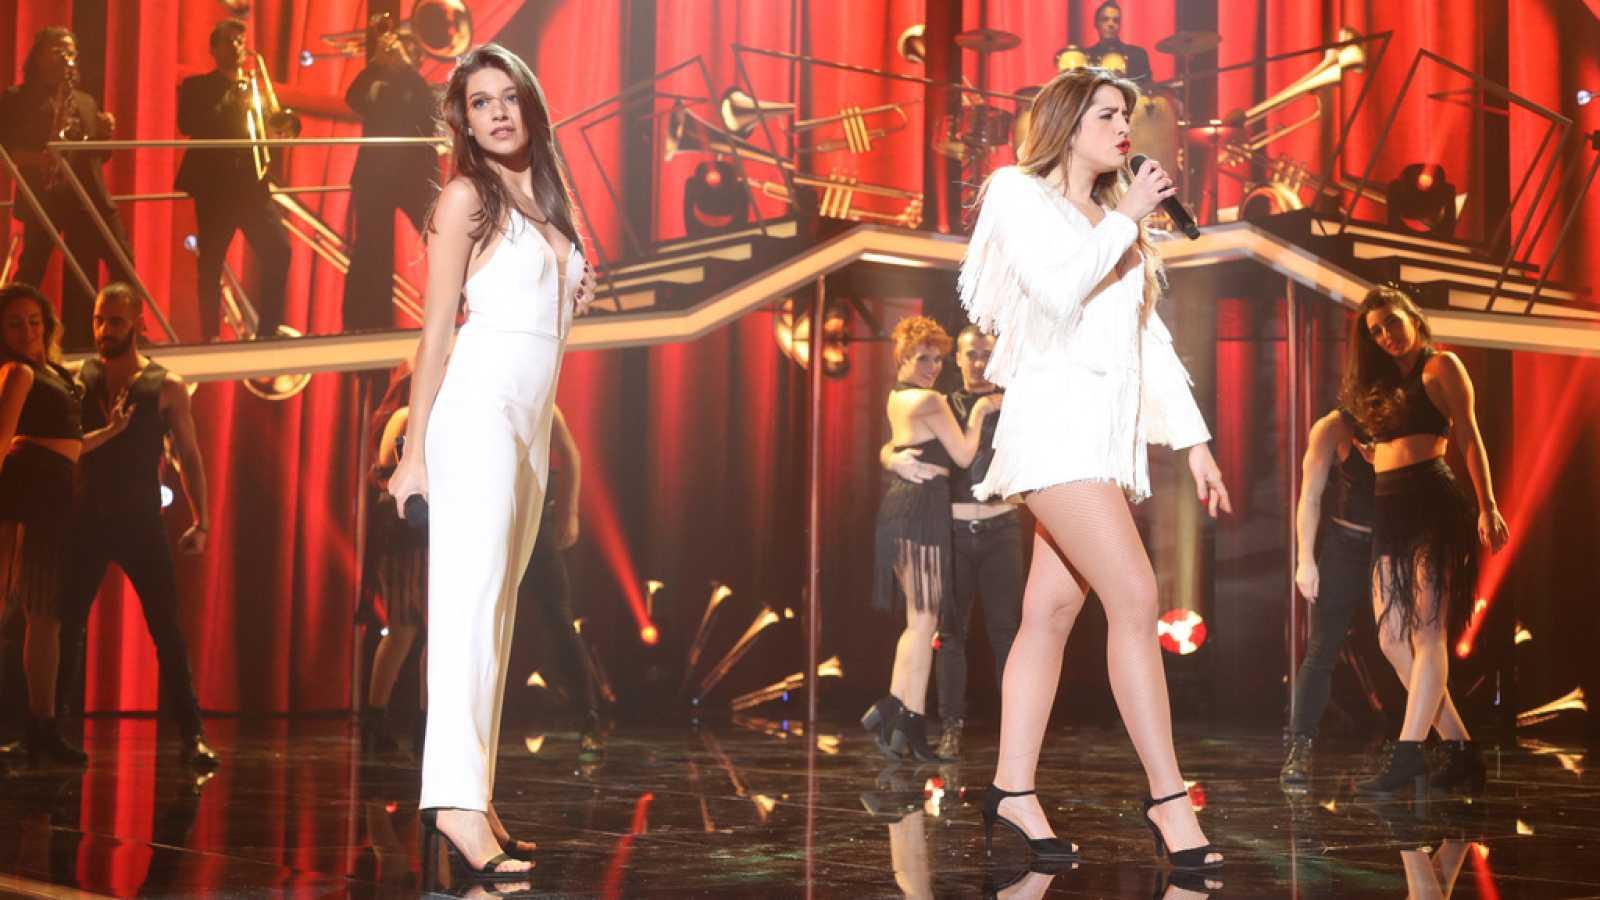 1f04ff603b Para todos los públicos Operación Triunfo - Ana y Mimi cantan  Don t you  worry about the thing reproducir video